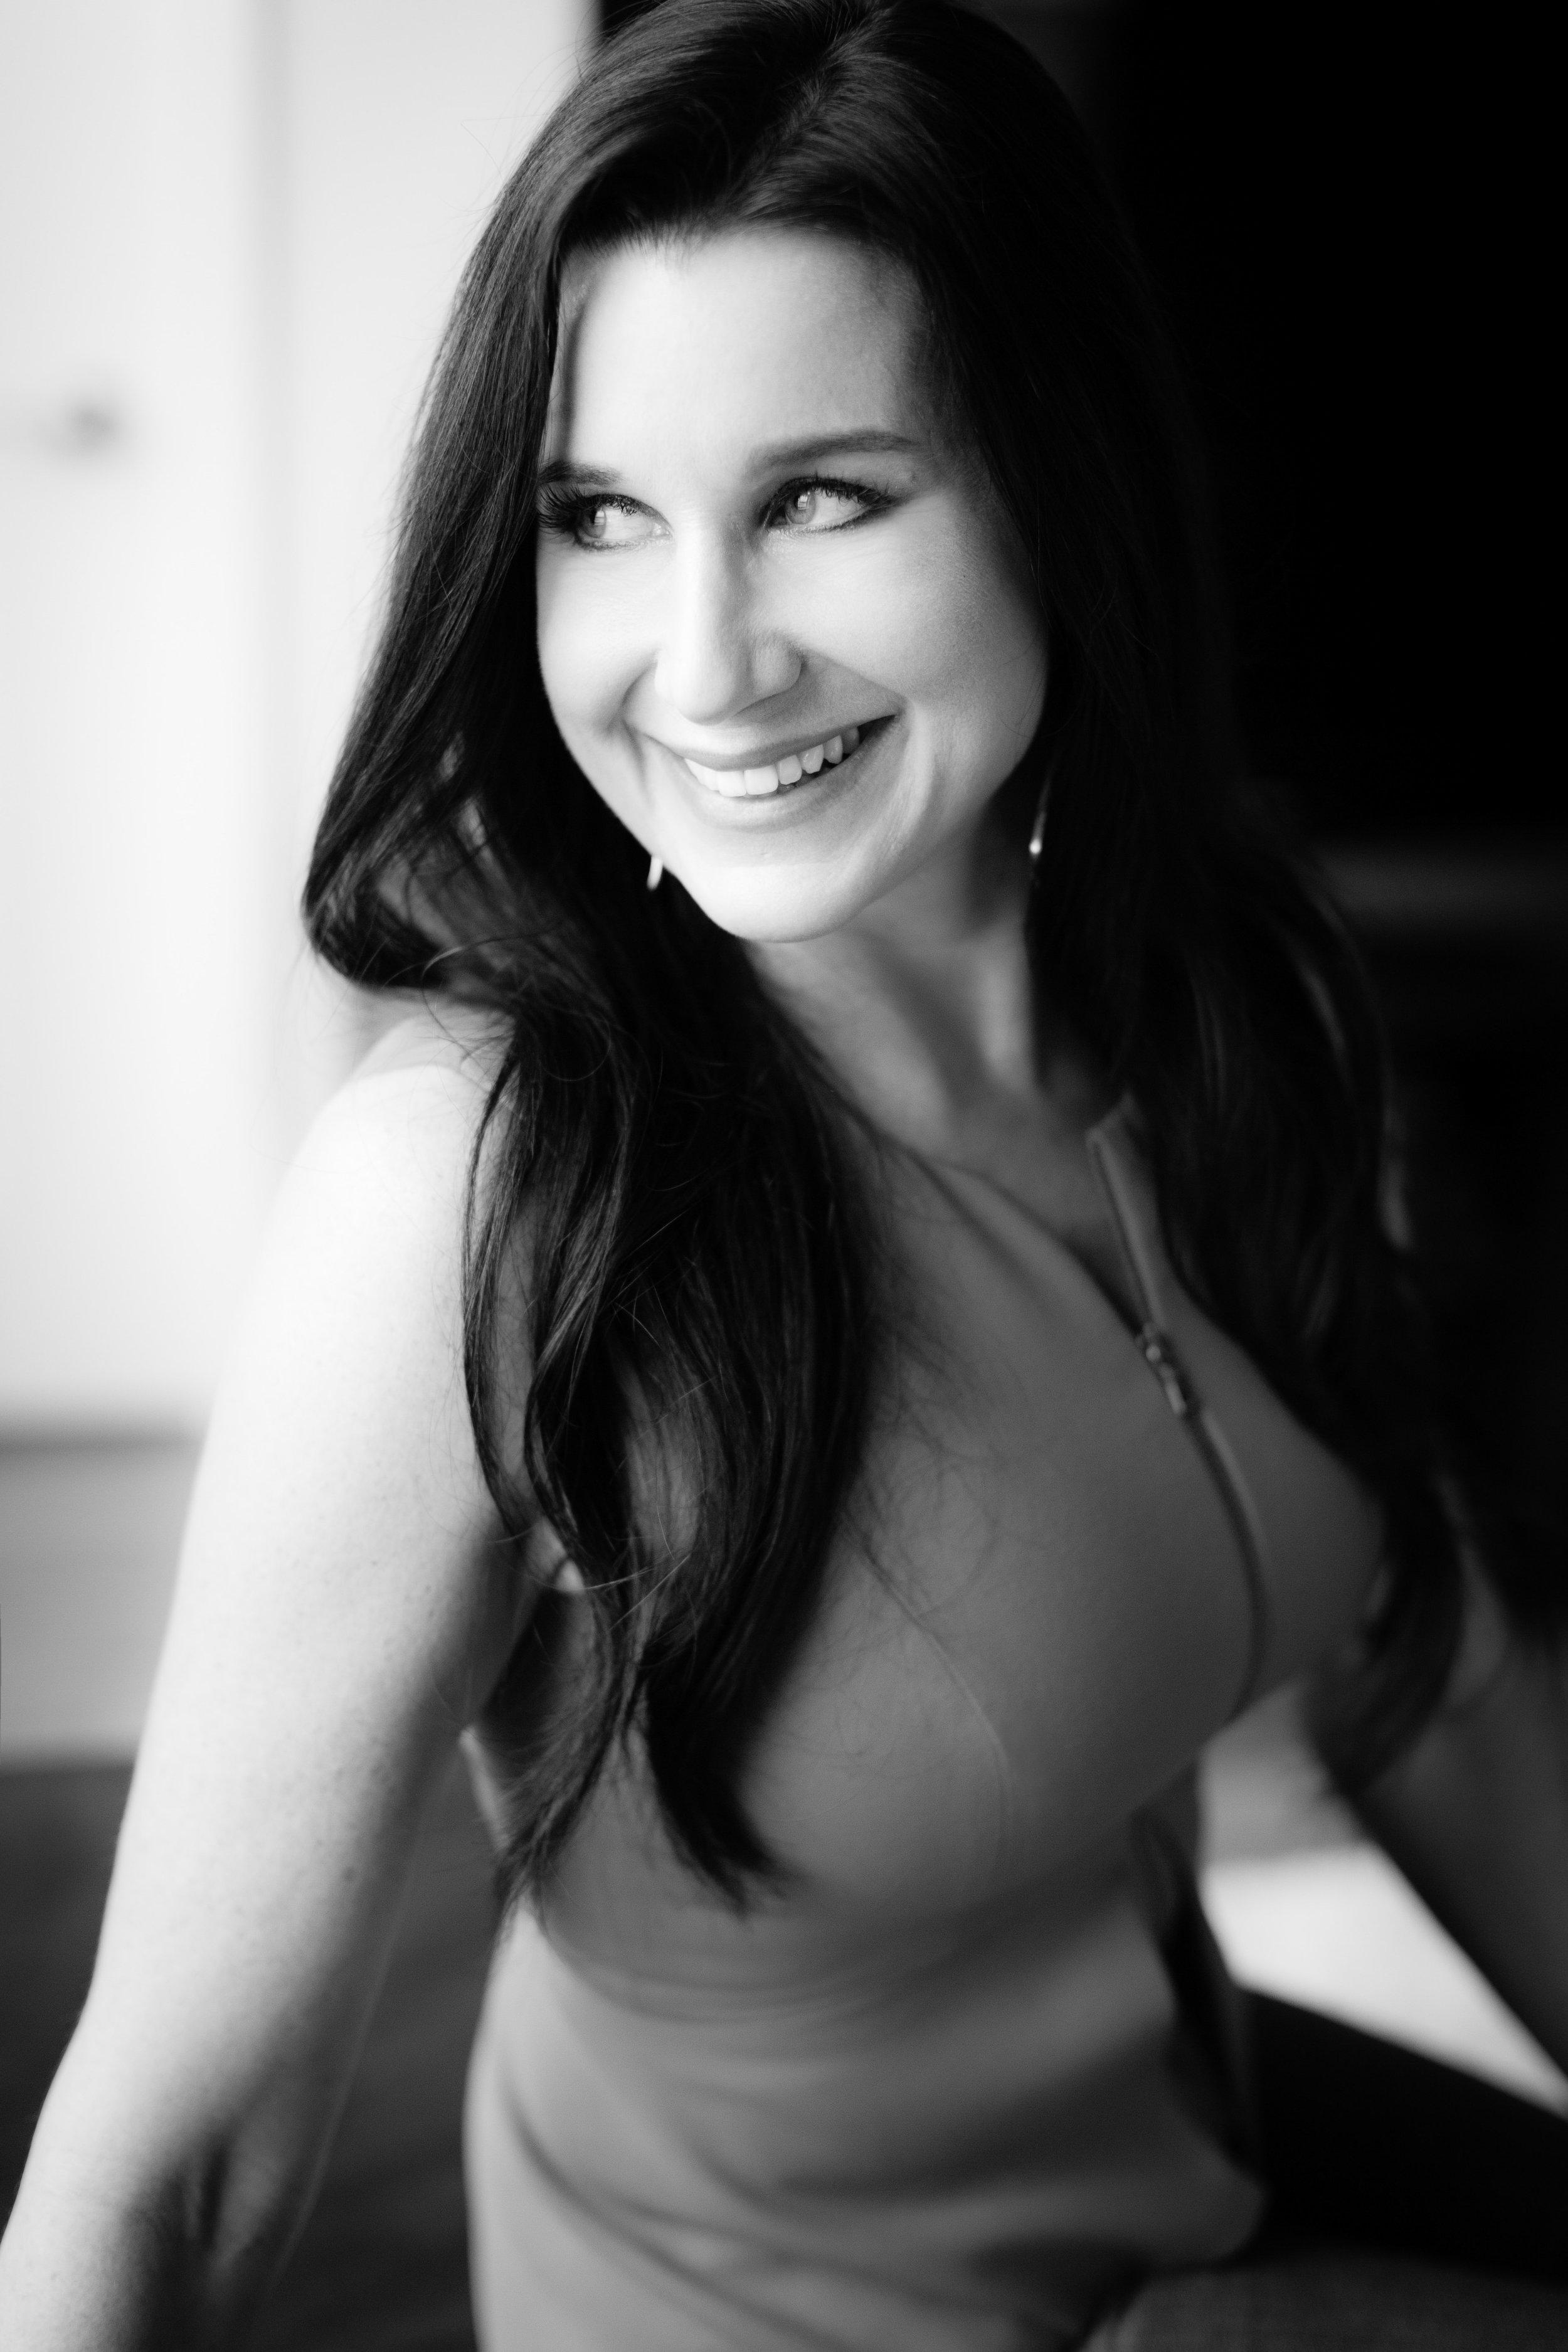 Jacqueline-BarbaraTorresPortraits.jpg